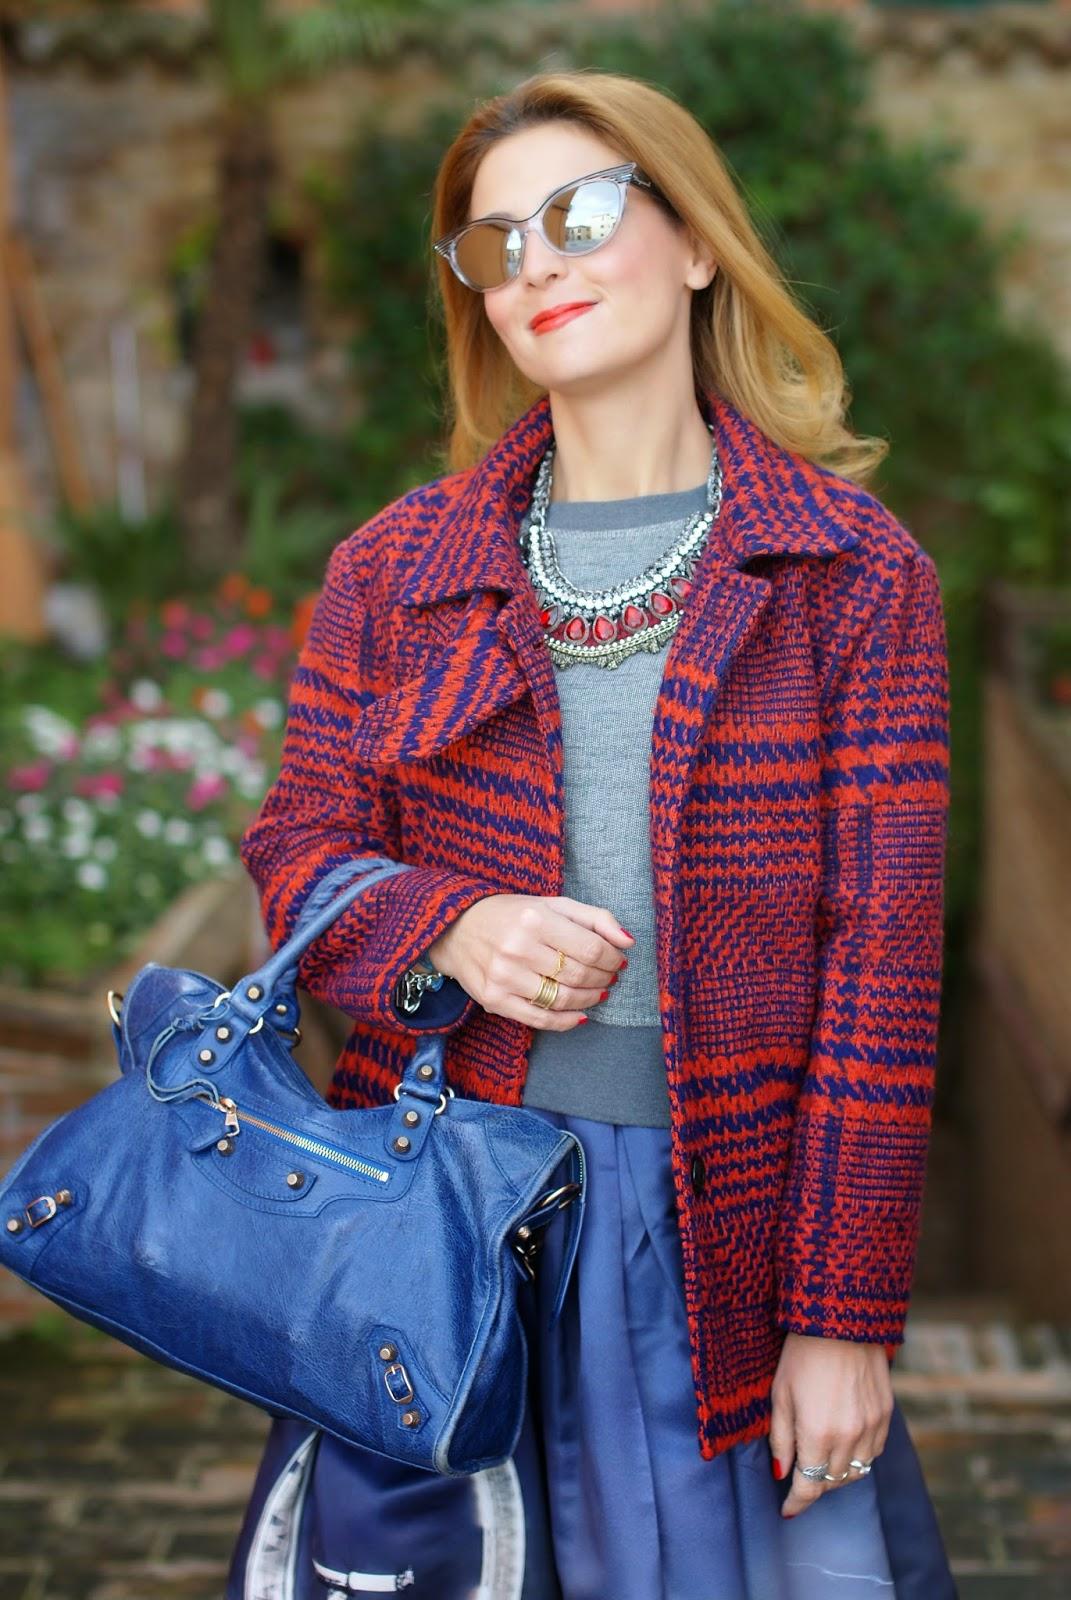 Chicwish London Skyline print, London Eye print midi skirt, Blackfive check coat, Fashion and Cookies, fashion blogger